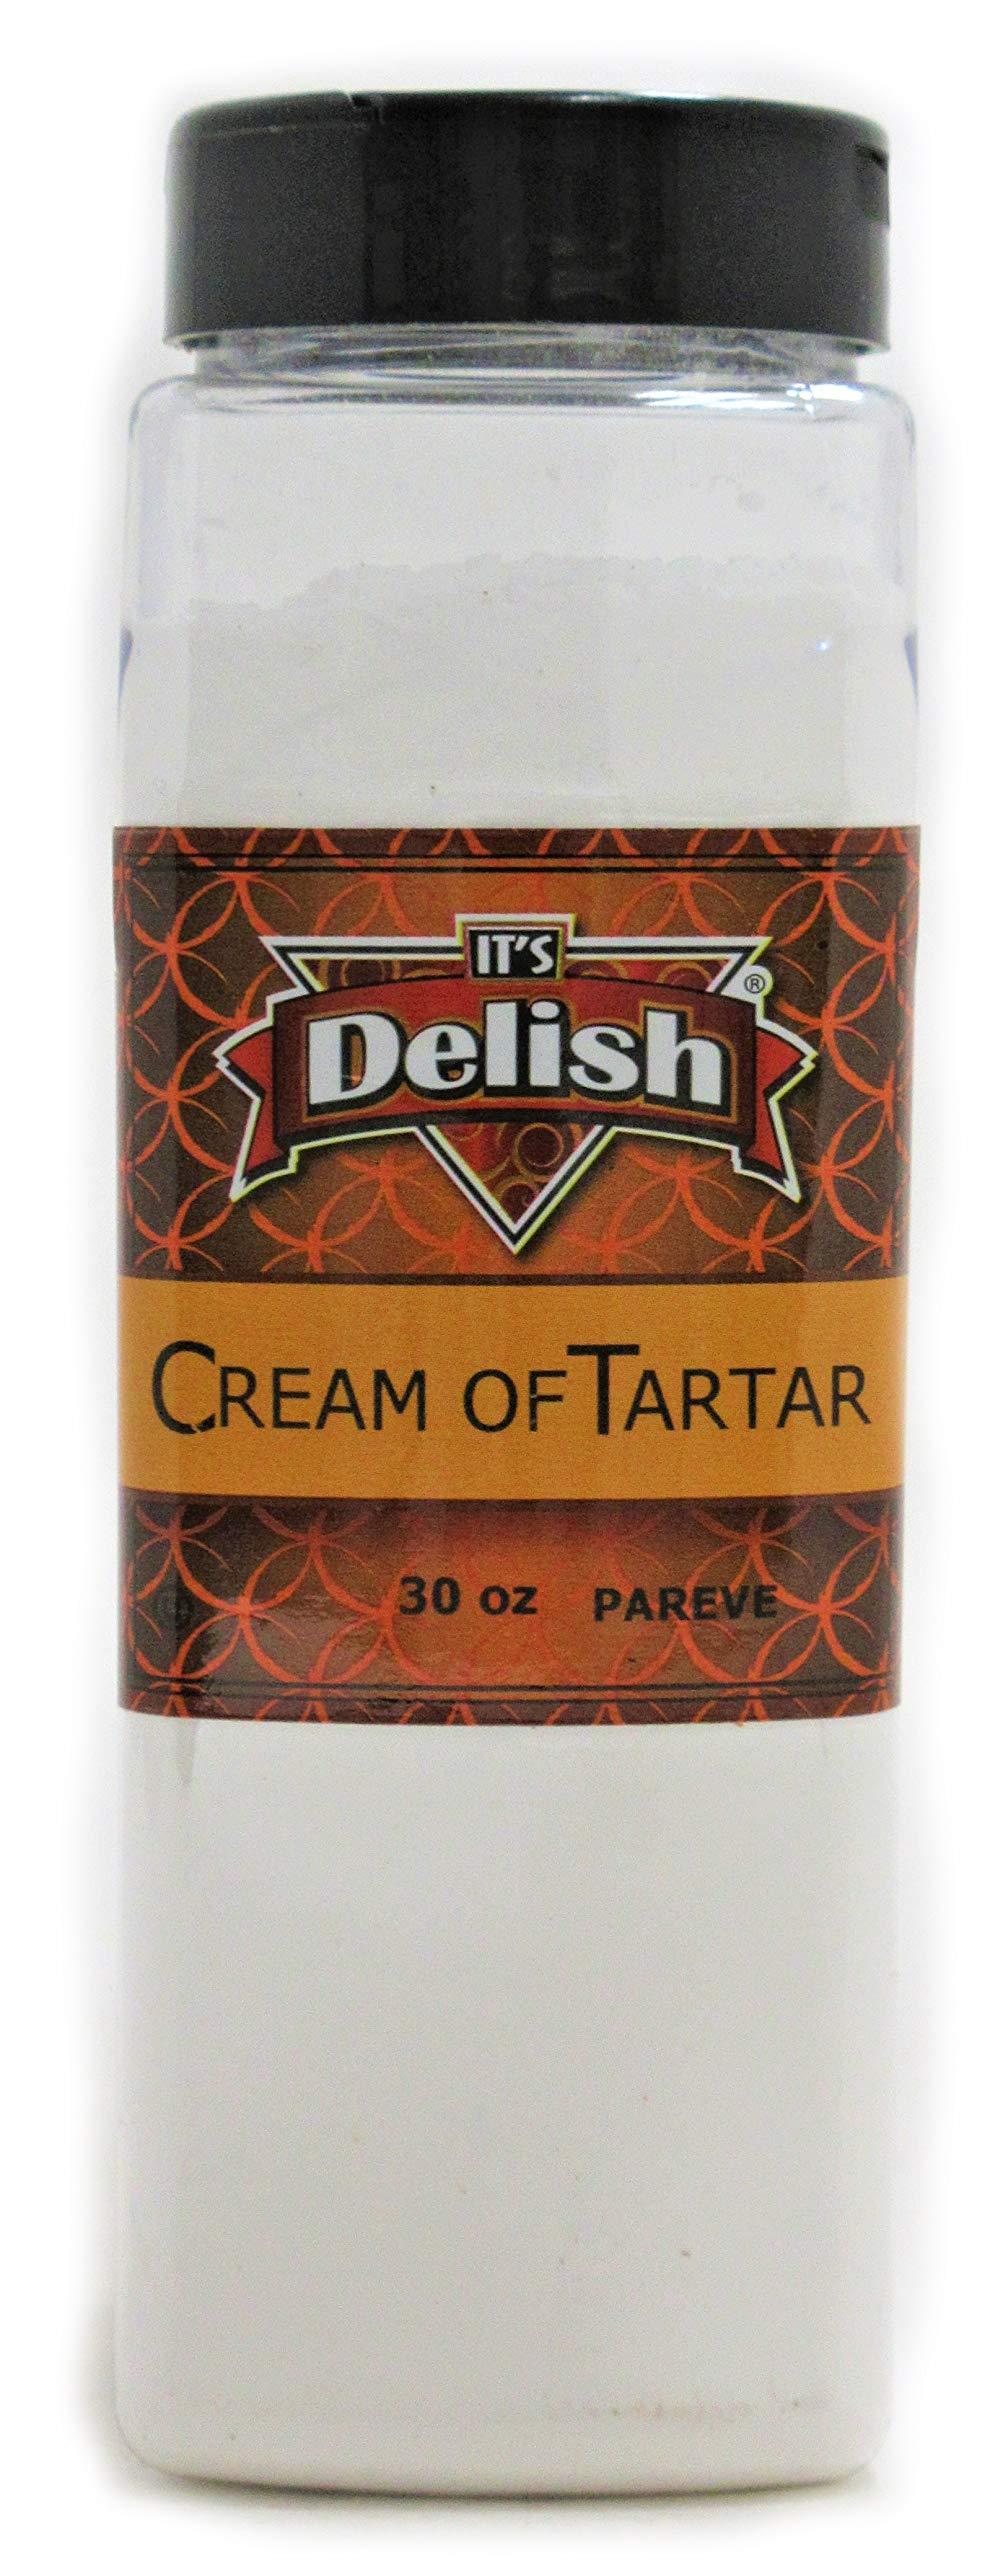 Cream of Tartar by Its Delish, 30 Oz Large Jar by Its Delish (Image #2)